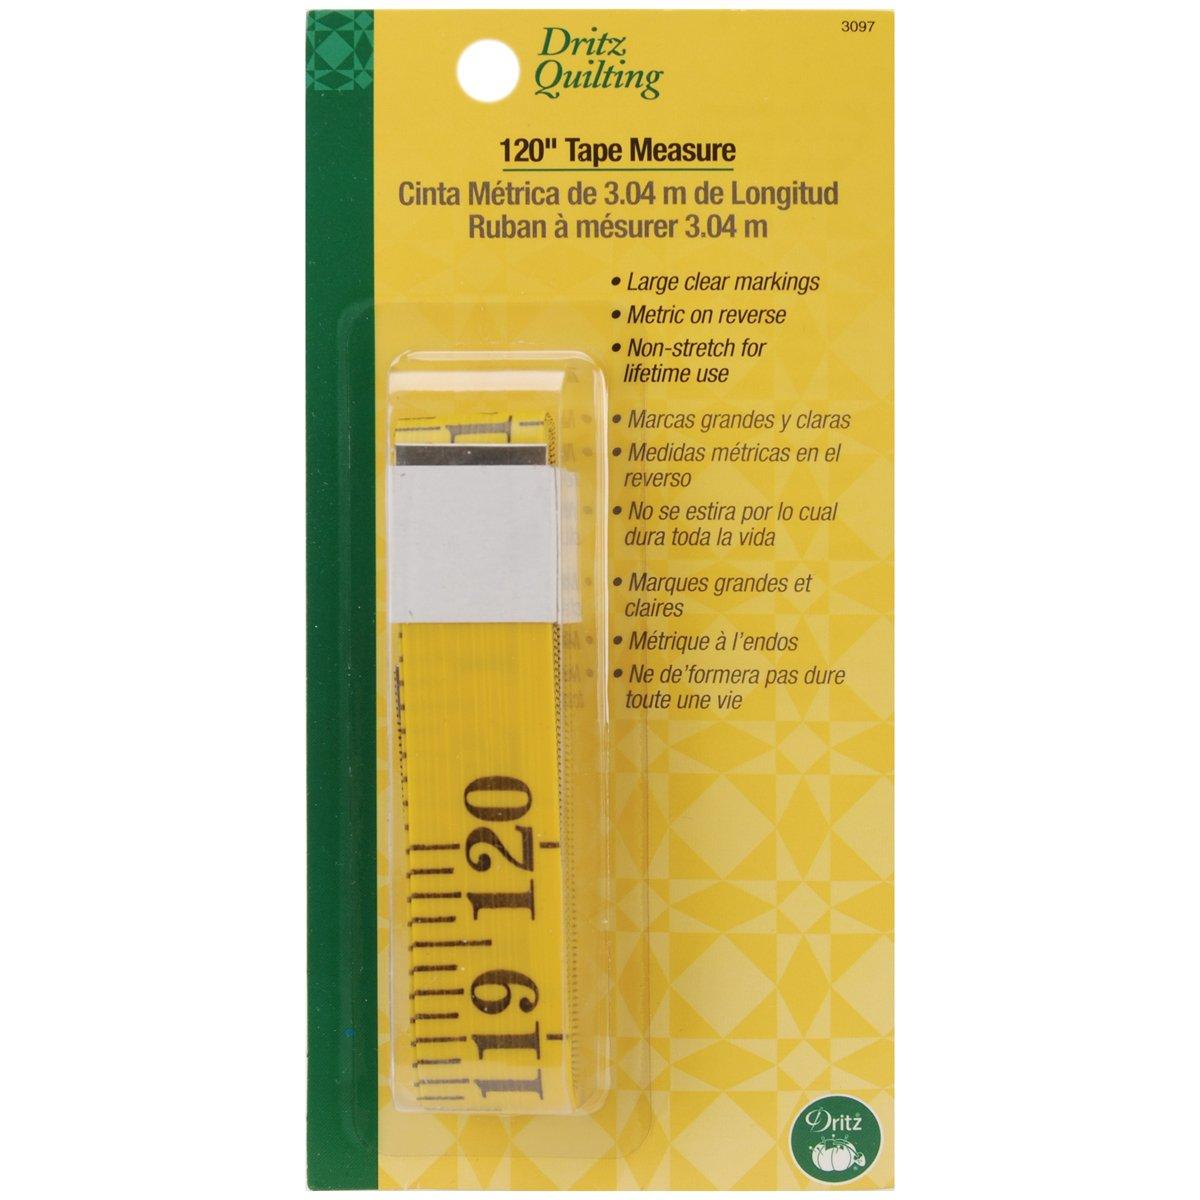 Amazon.com: Dritz Quilting 120-Inch Tape Measure: Arts, Crafts ... : quilting measuring tools - Adamdwight.com